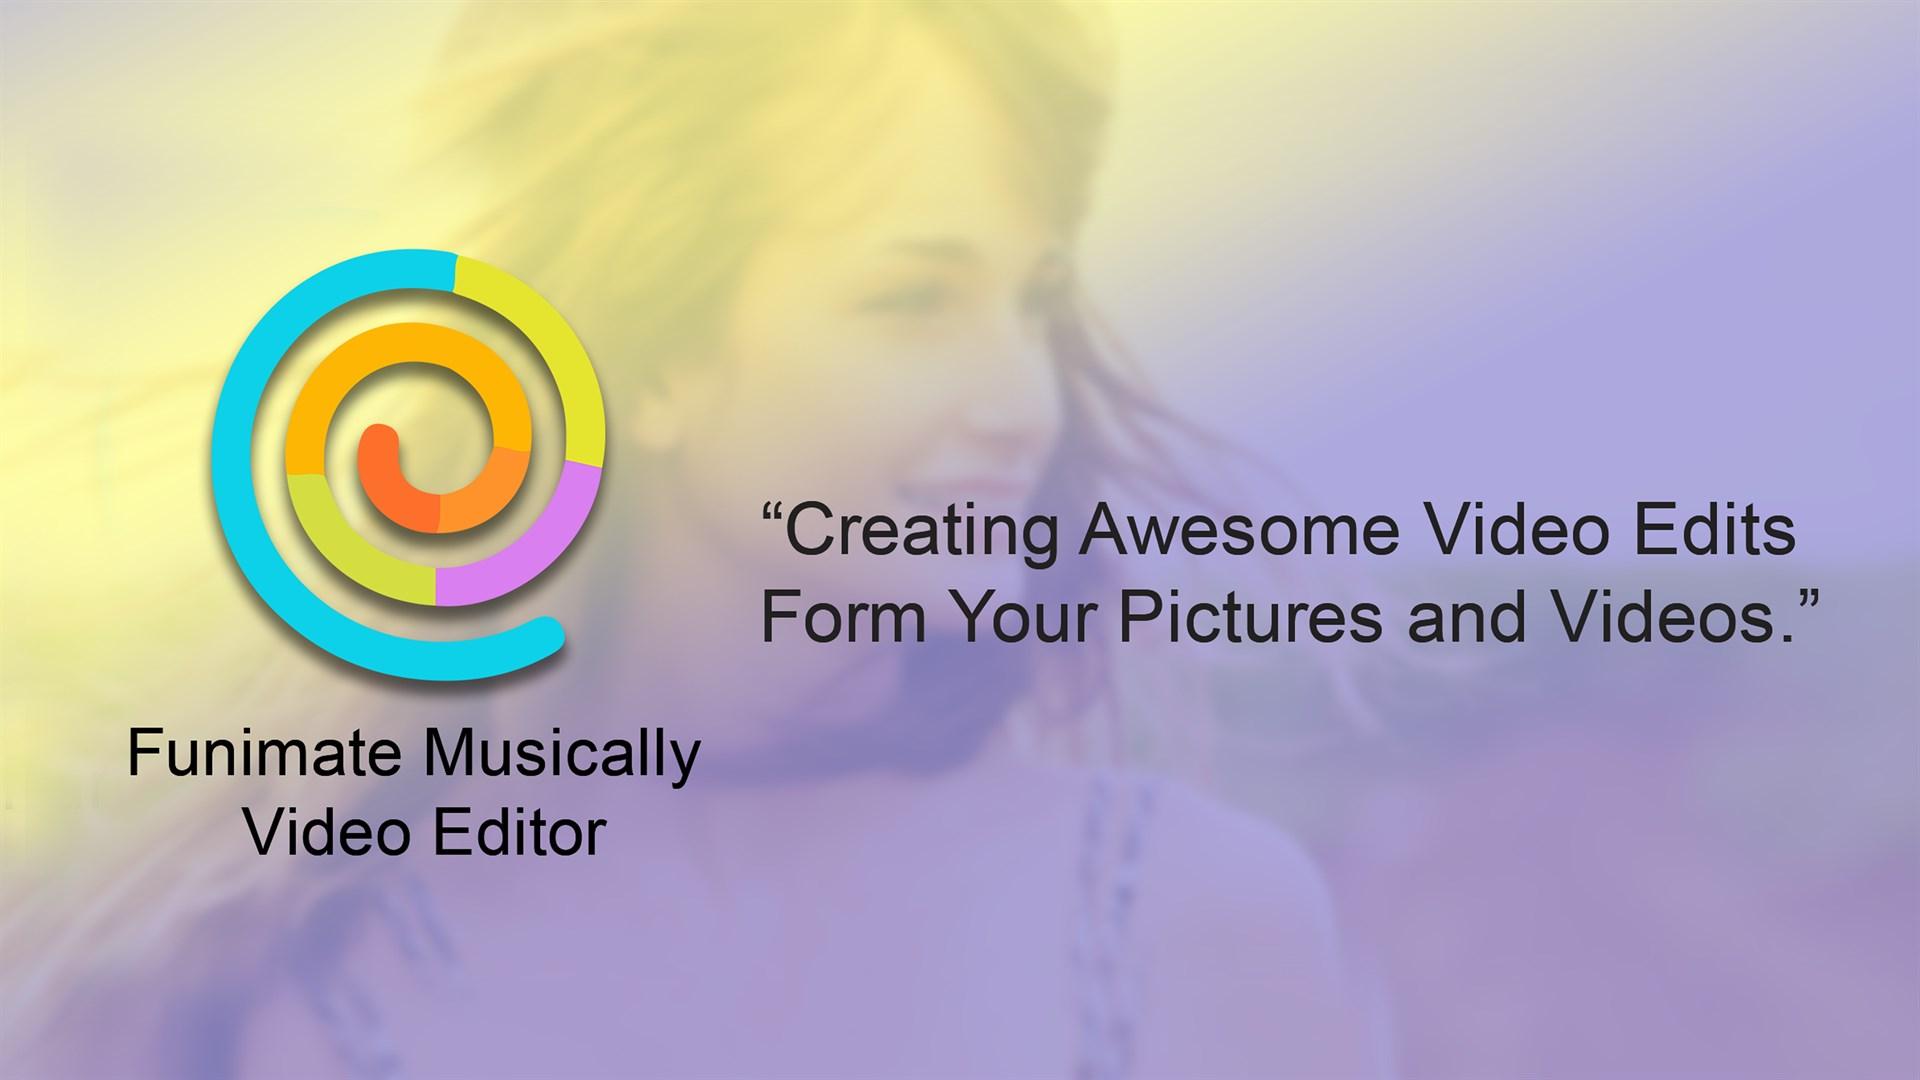 Get funimate musical video editor microsoft store izmirmasajfo